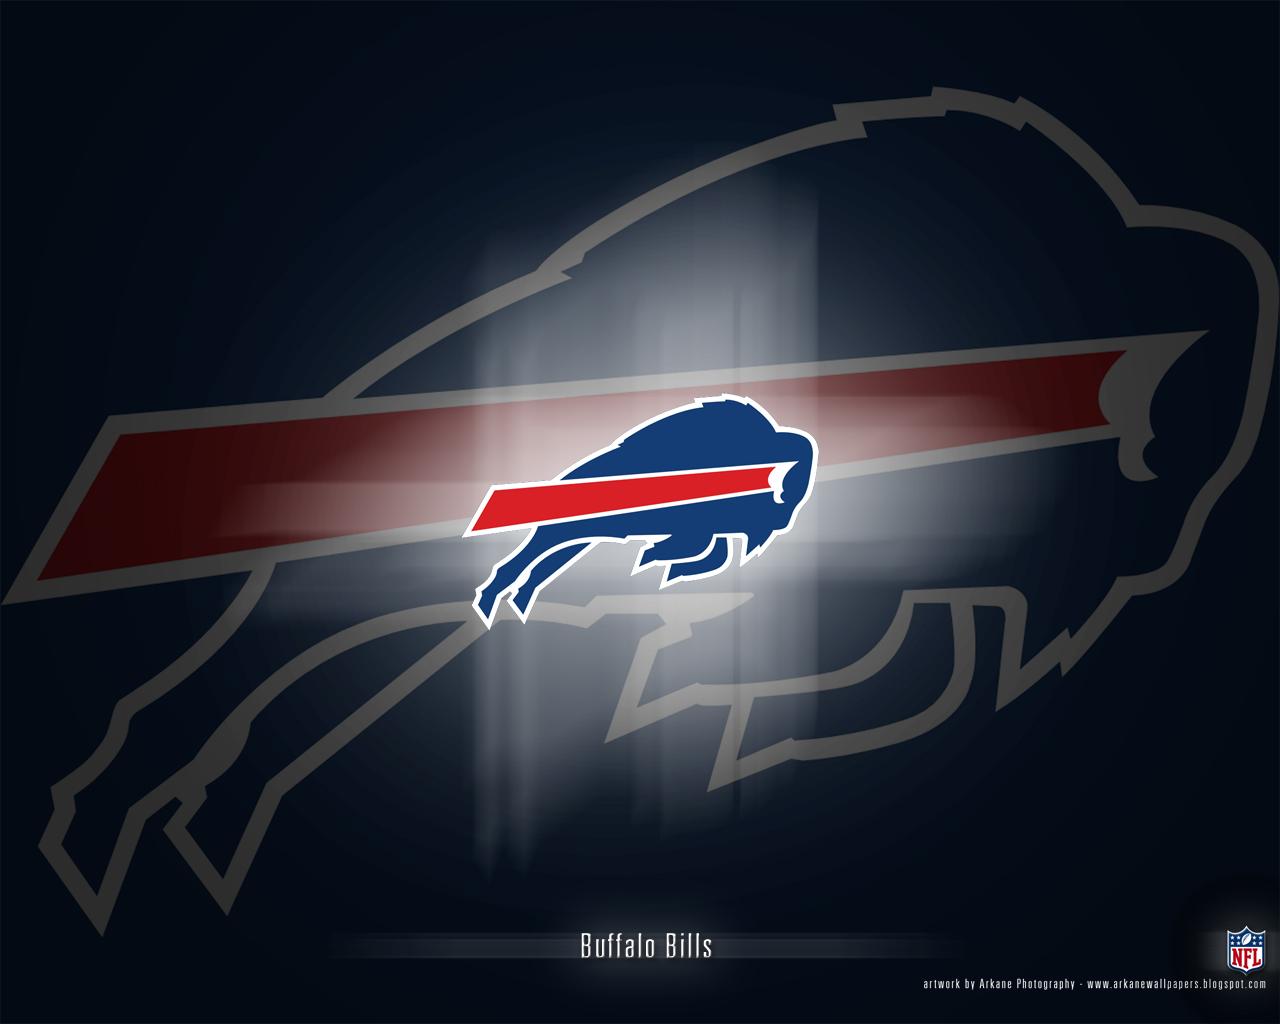 Arkane NFL Wallpapers Buffalo Bills   Vol 1 1280x1024